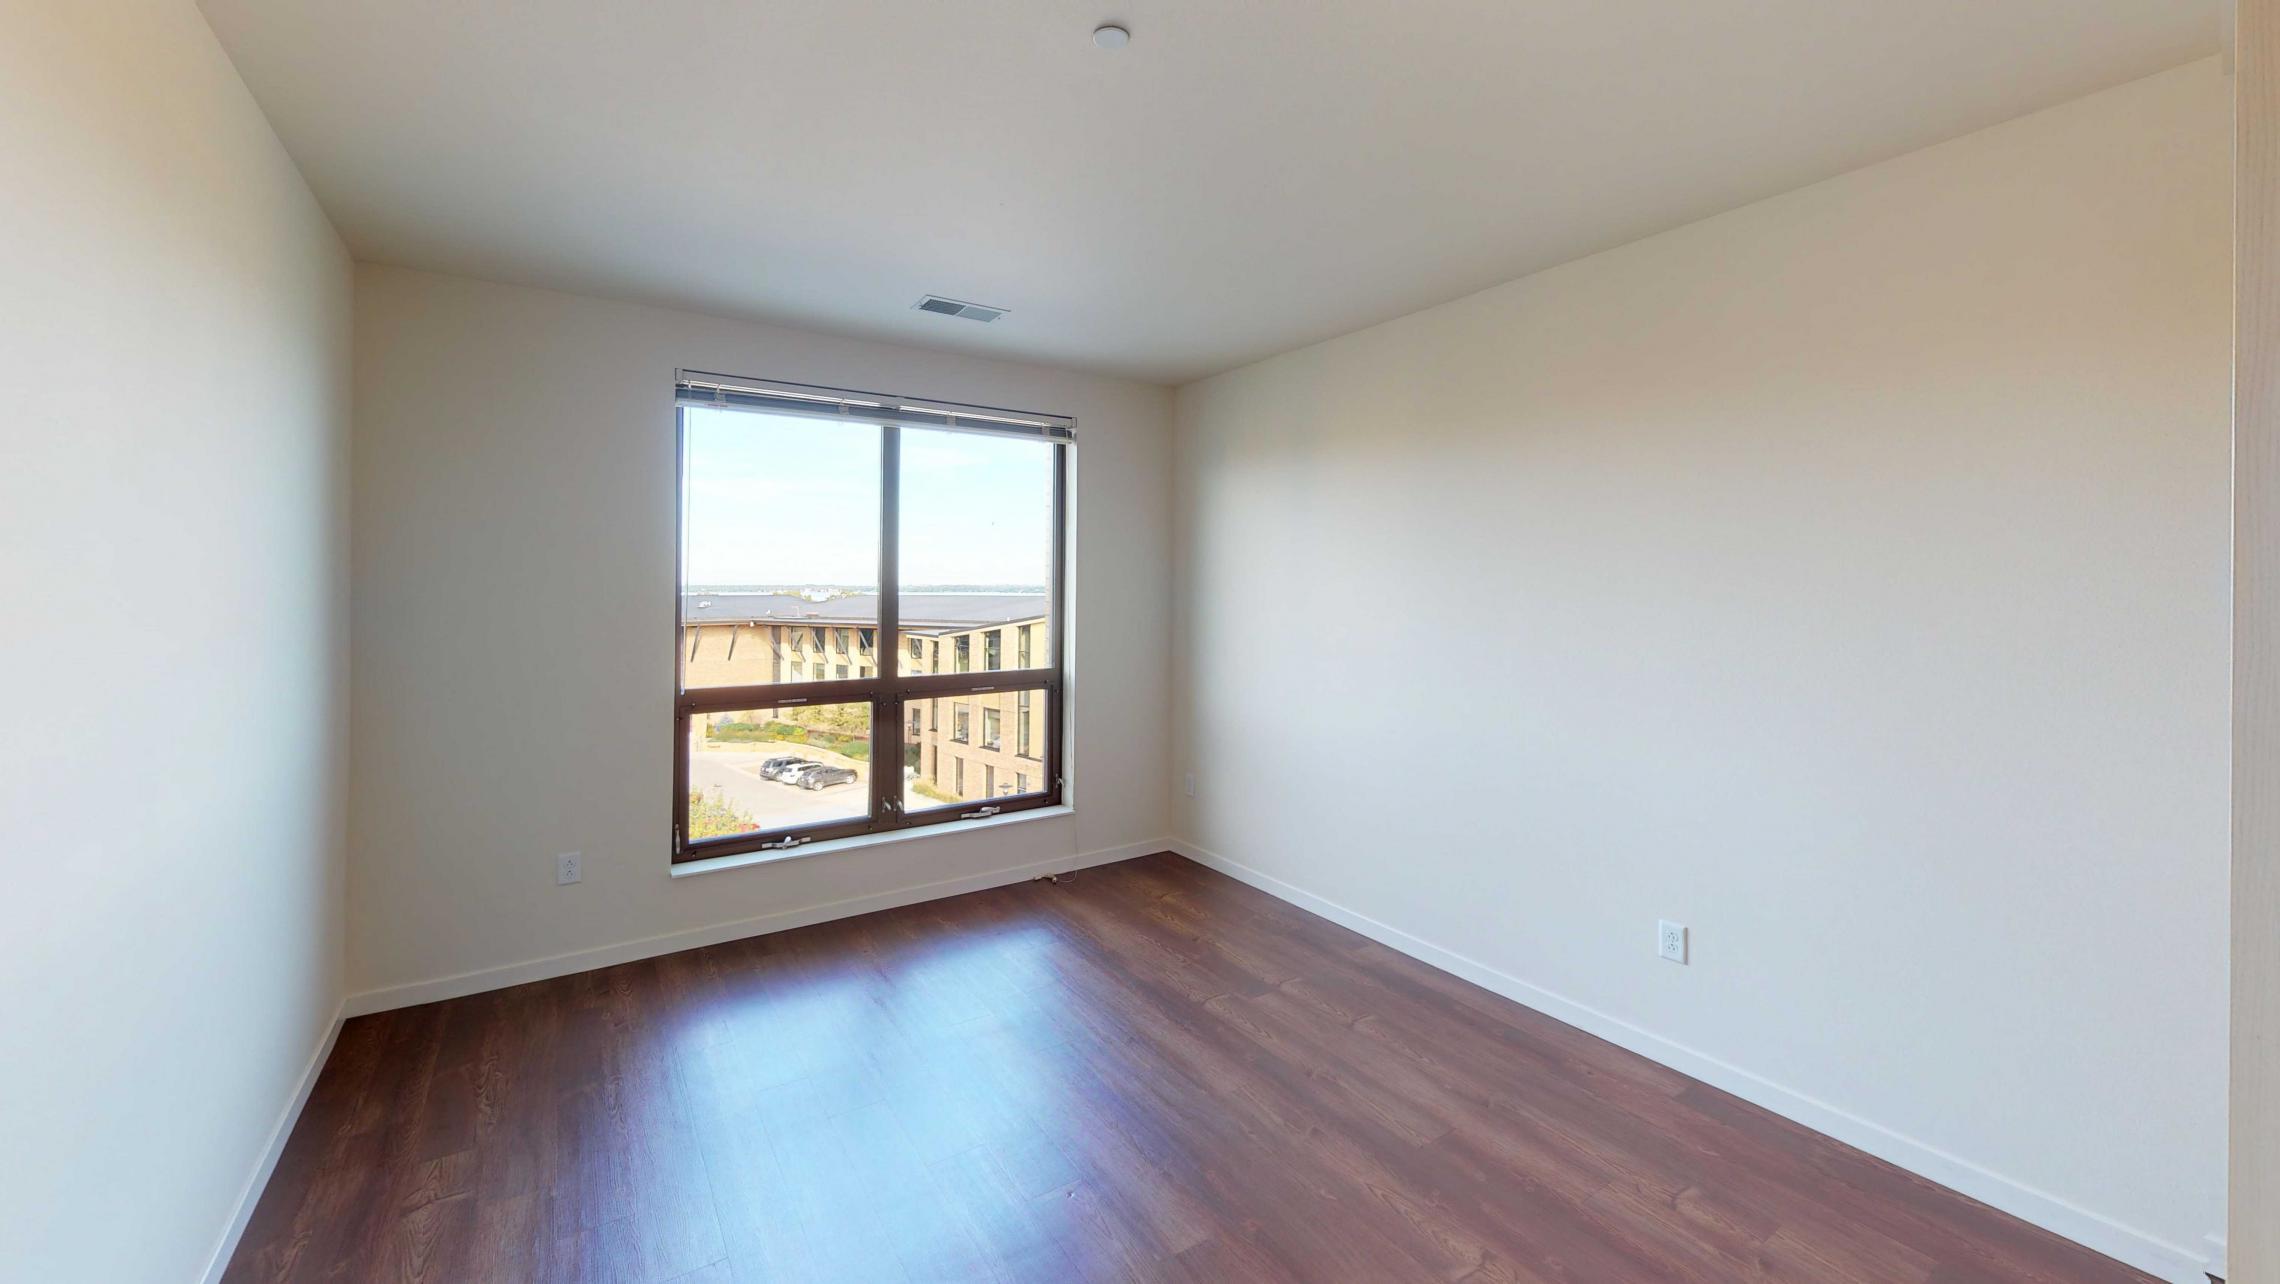 Nine-Line-Apartment-517-bedroom-lake-view-capitol-city-downtown-balcony-modern-luxury-upscale.jpg